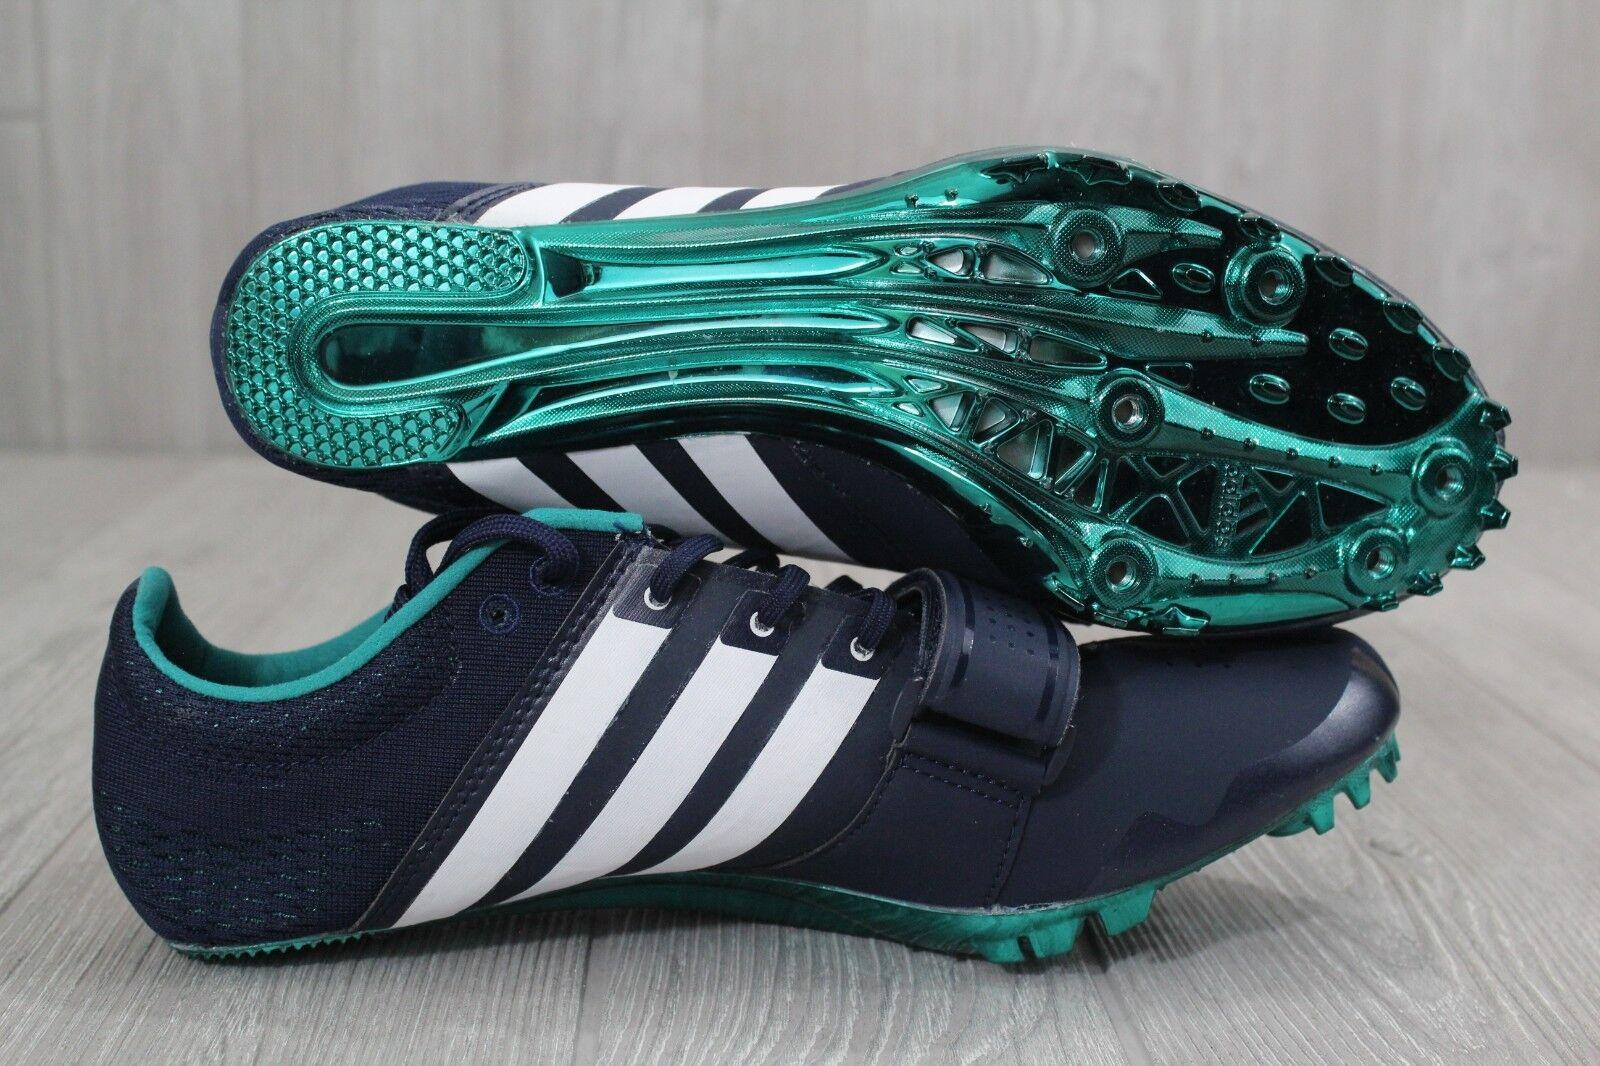 26 New New 26 Uomo Adidas Blue bianca Running Adizero Accelerator Spikes S78629 8.5-12.5 394b8f